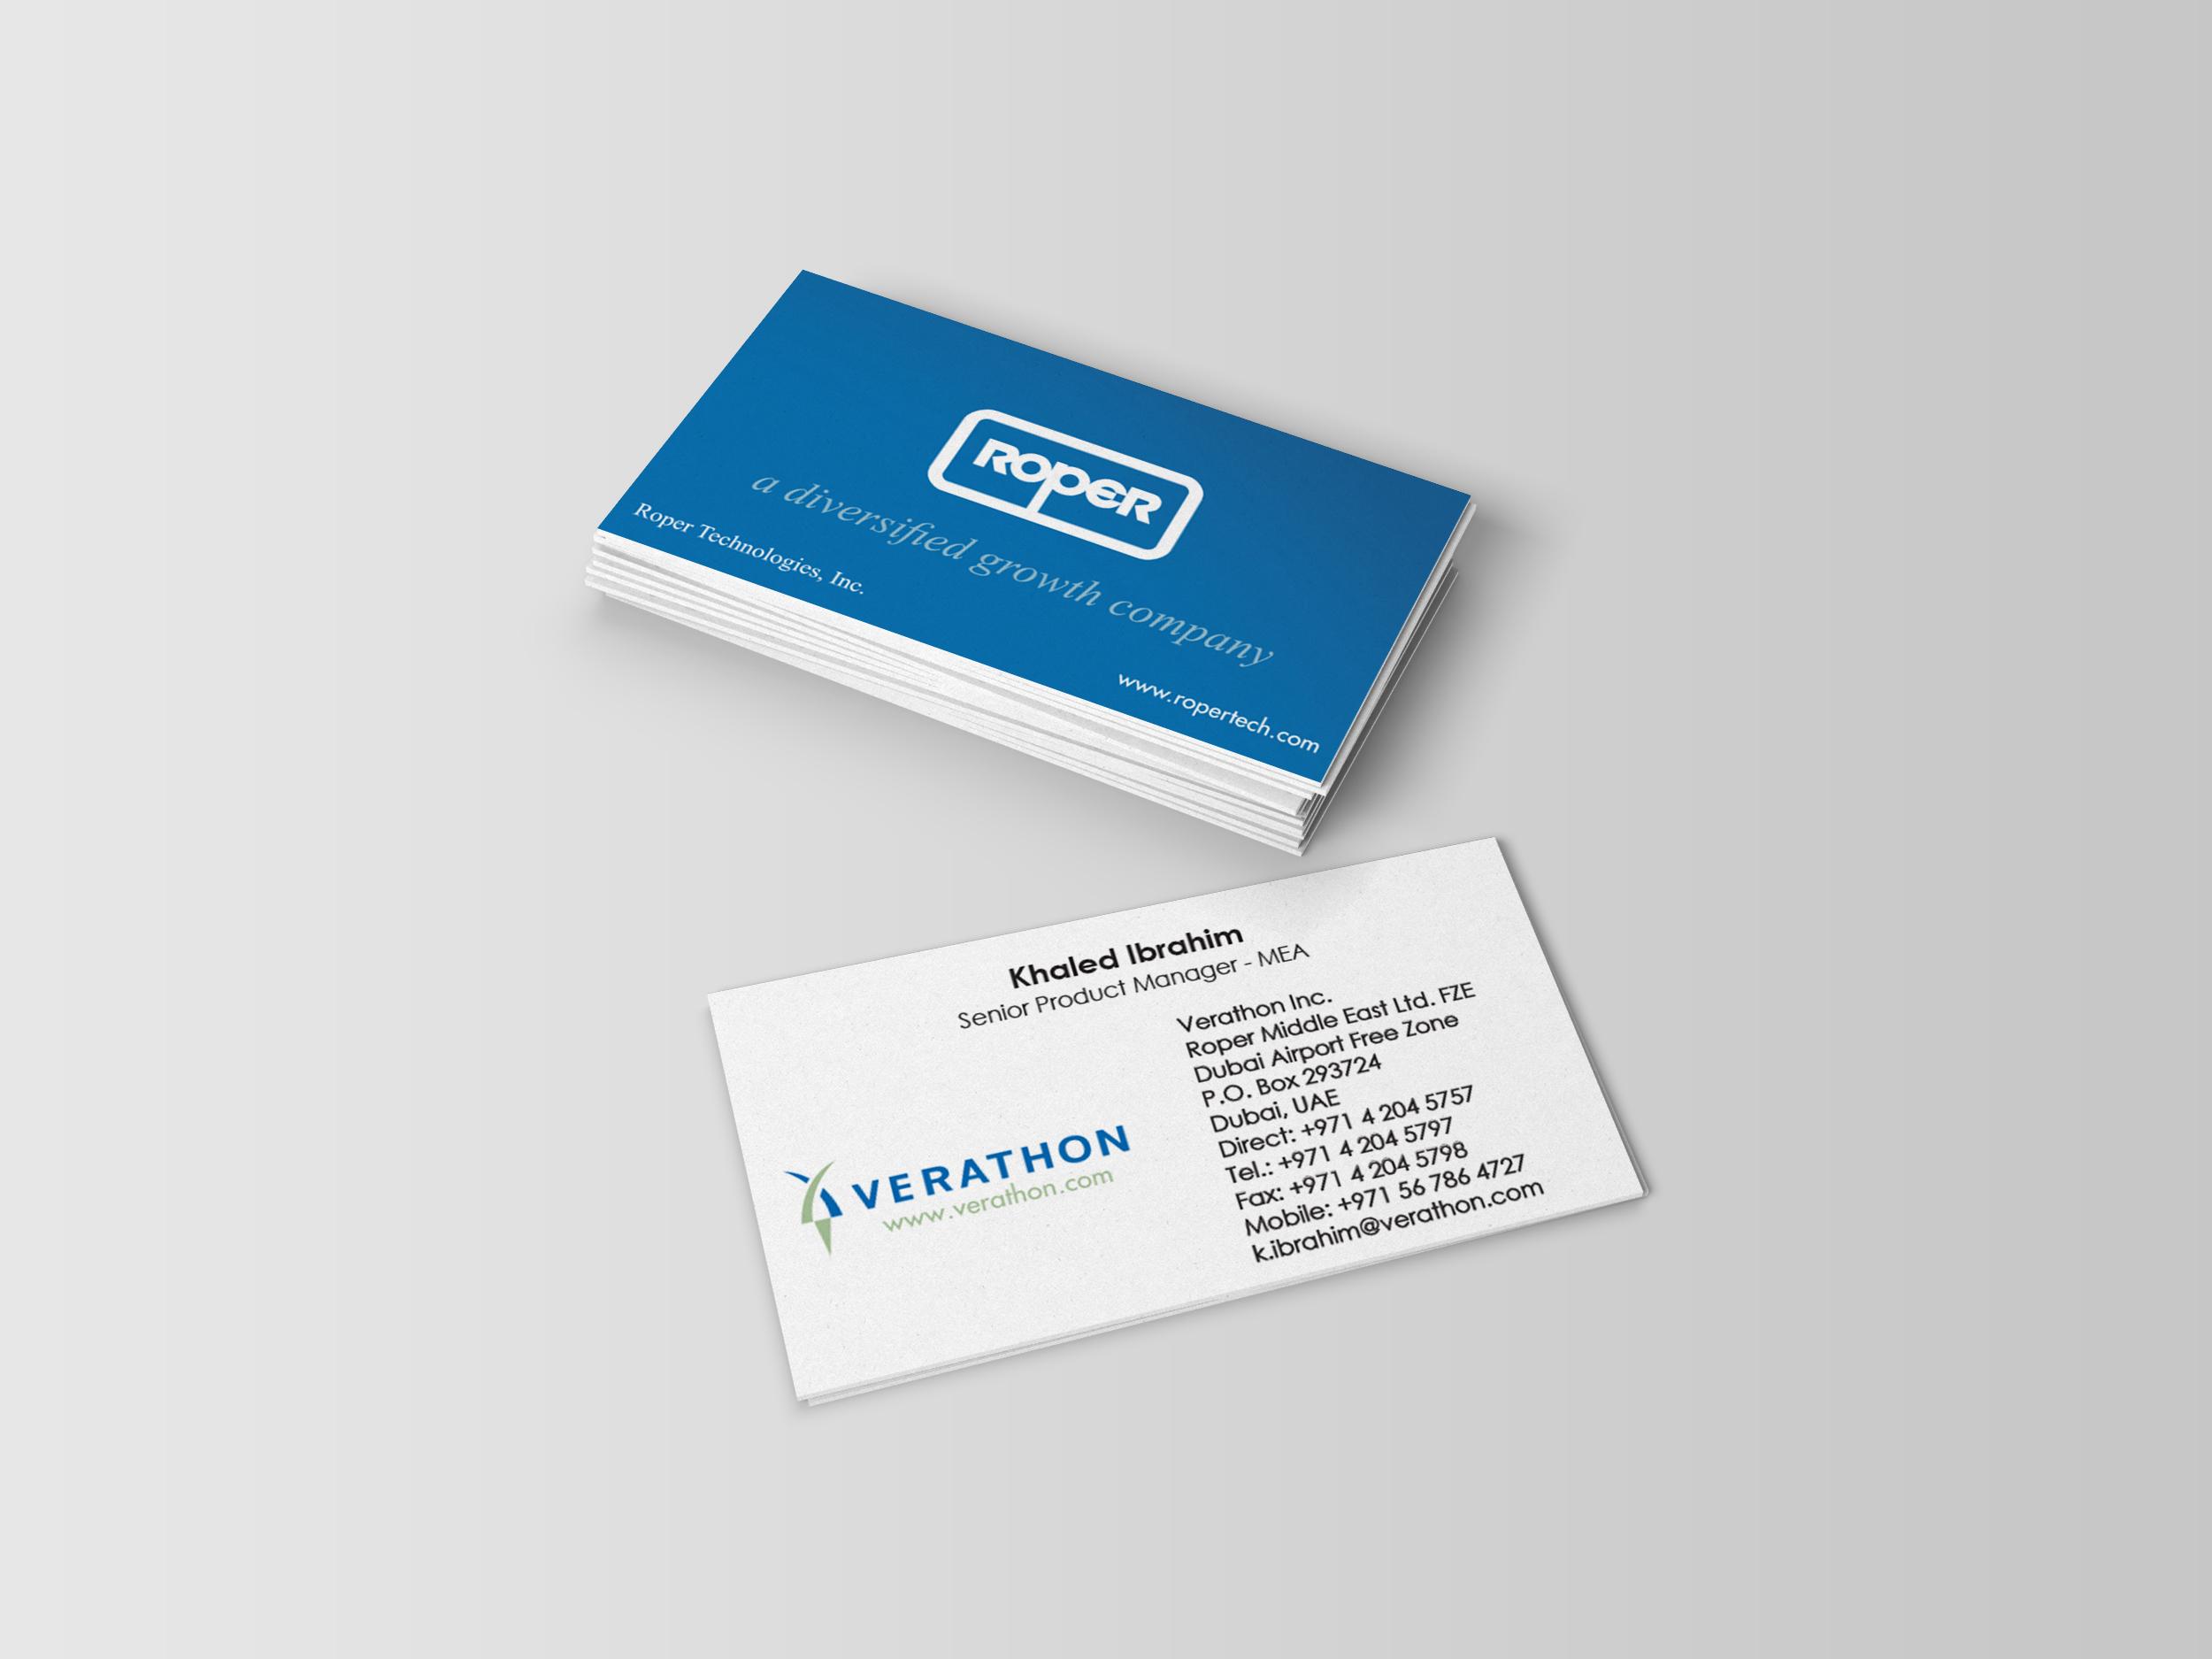 Al jannath visiting cards mystic web design seo roper v card colourmoves